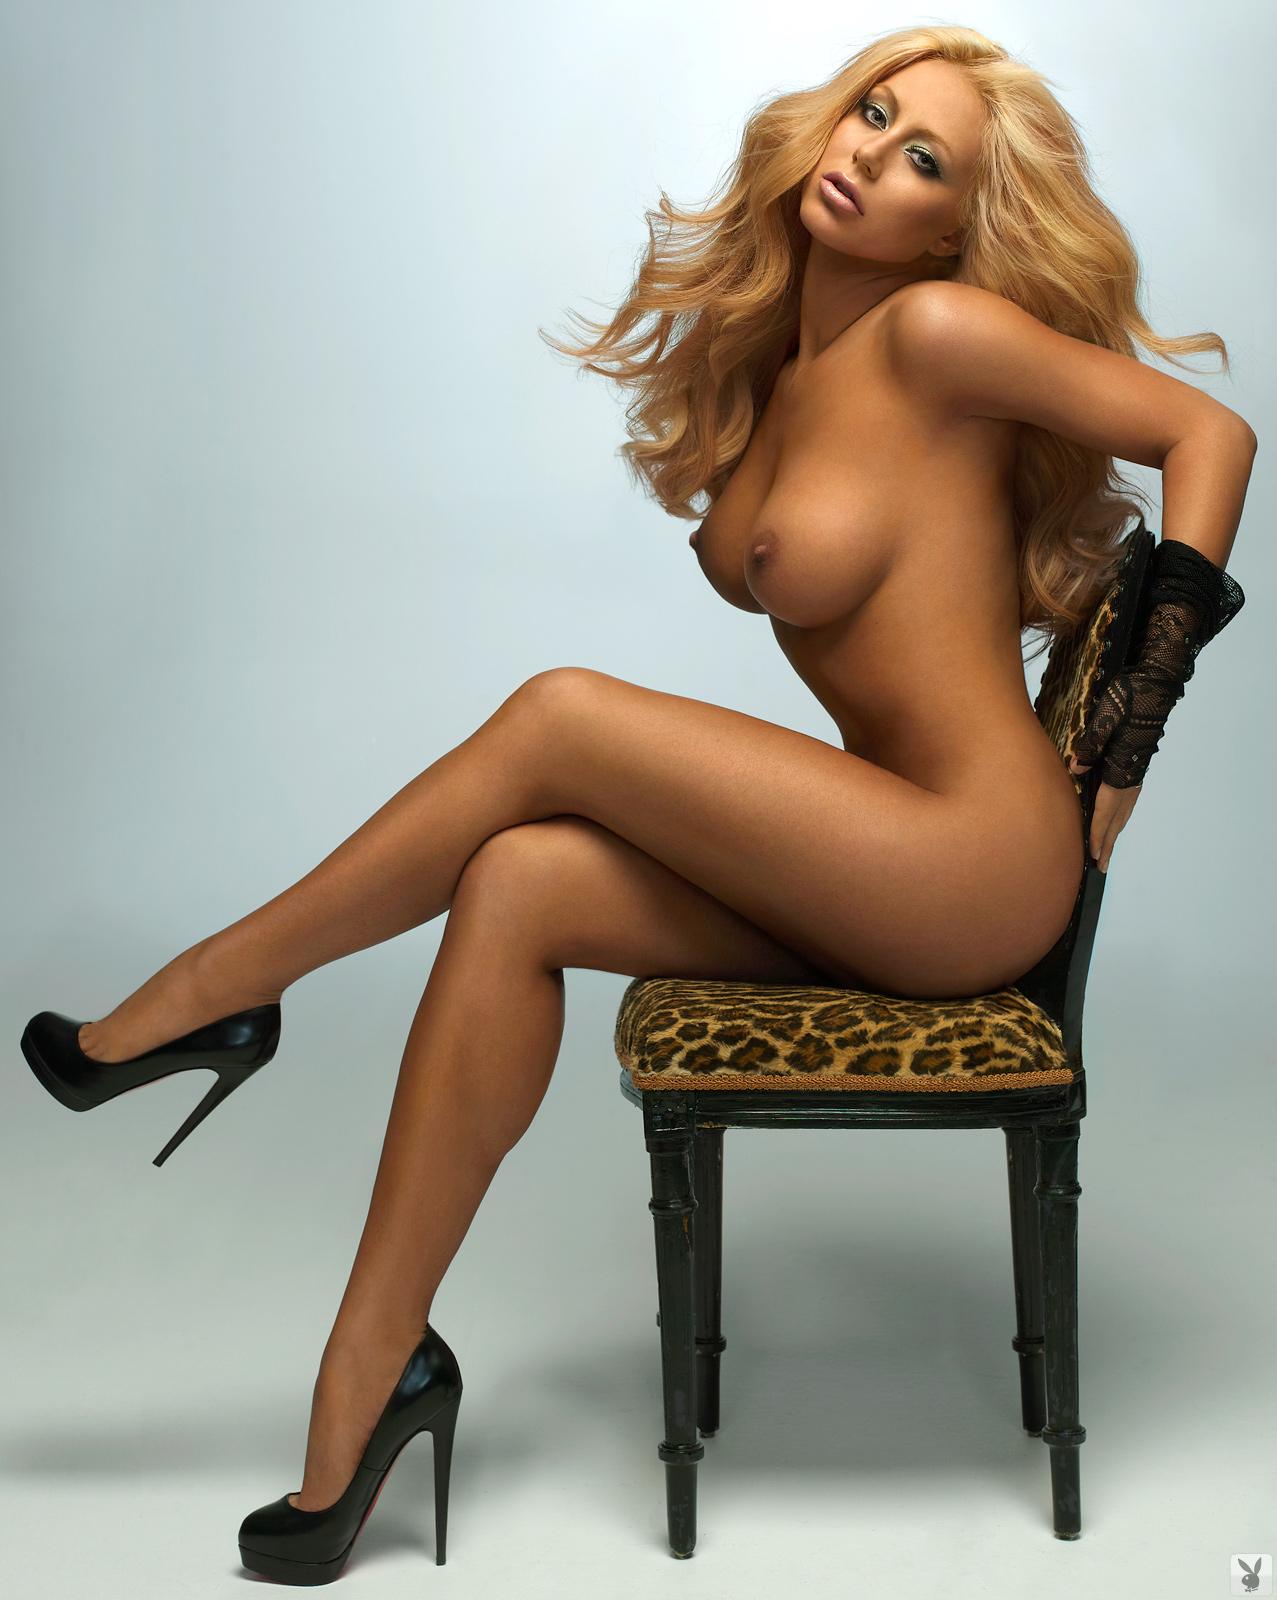 huge-boobs-tits-naked-mix-vol5-43